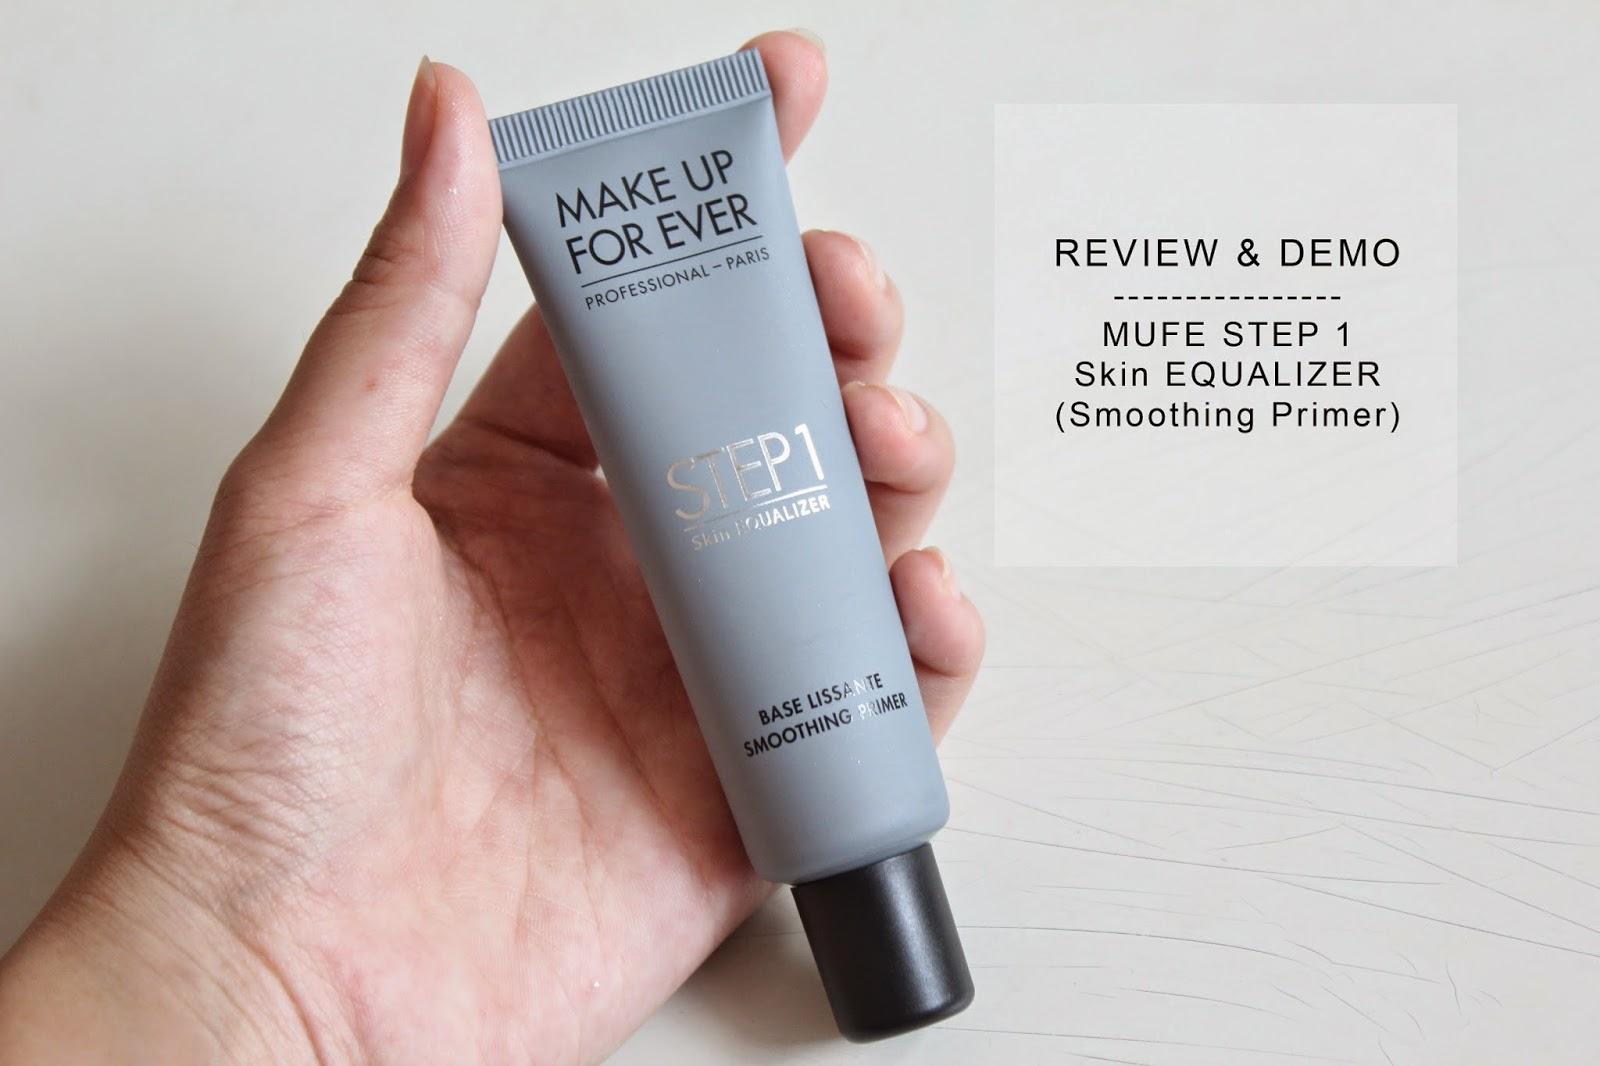 Makeup Forever Smoothing Primer Uk